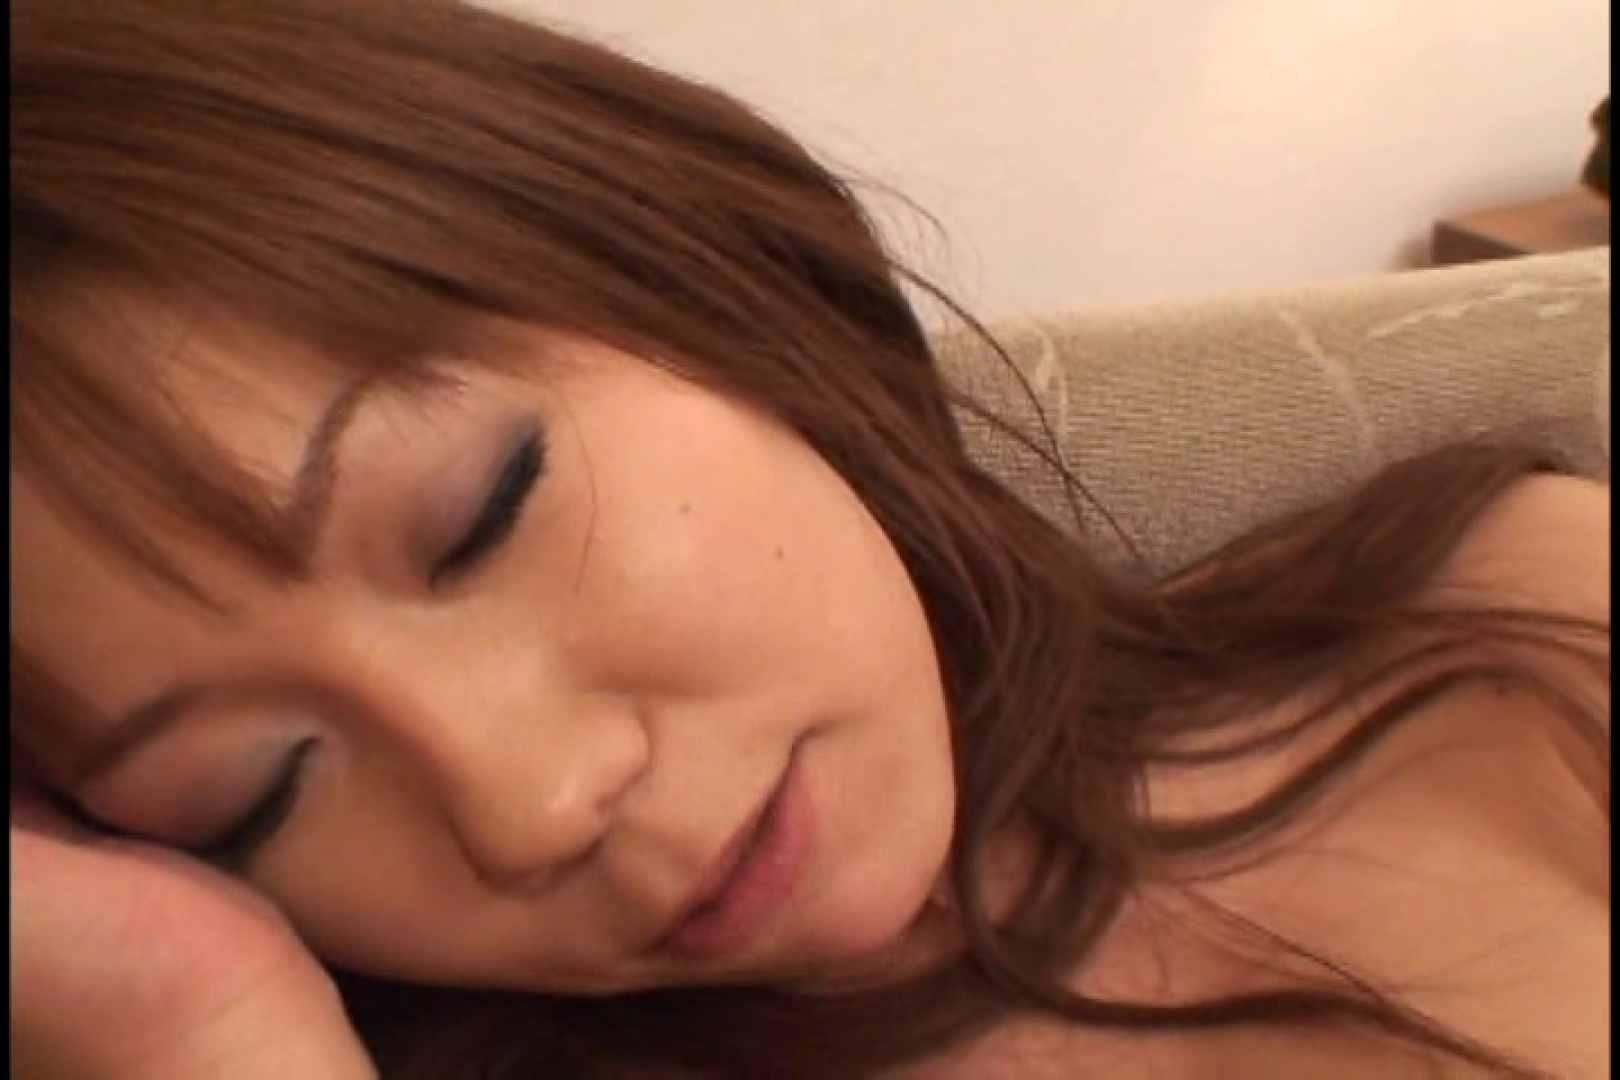 JDハンター全国ツアー vol.013 後編 女子大生のエロ動画 | 0  106PIX 71